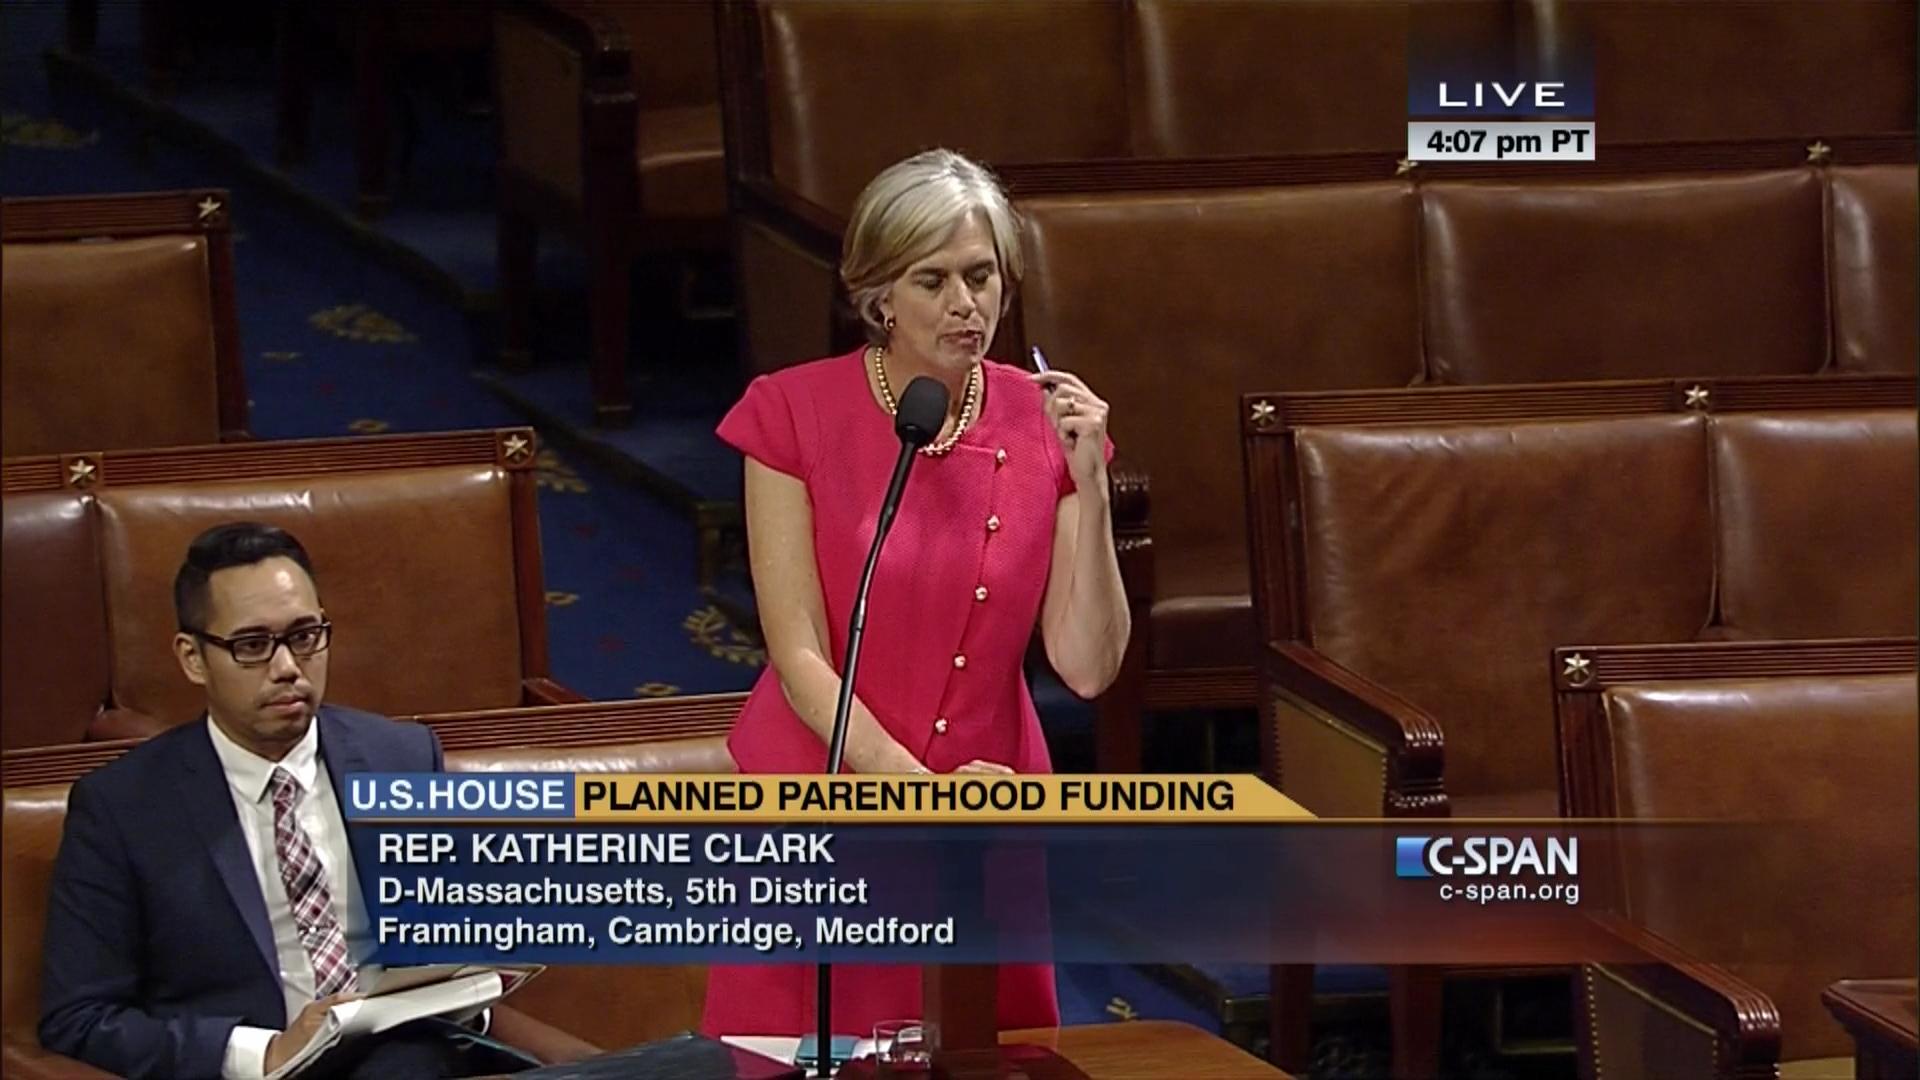 Congresswoman Katherine Clark on Planned Parenthood